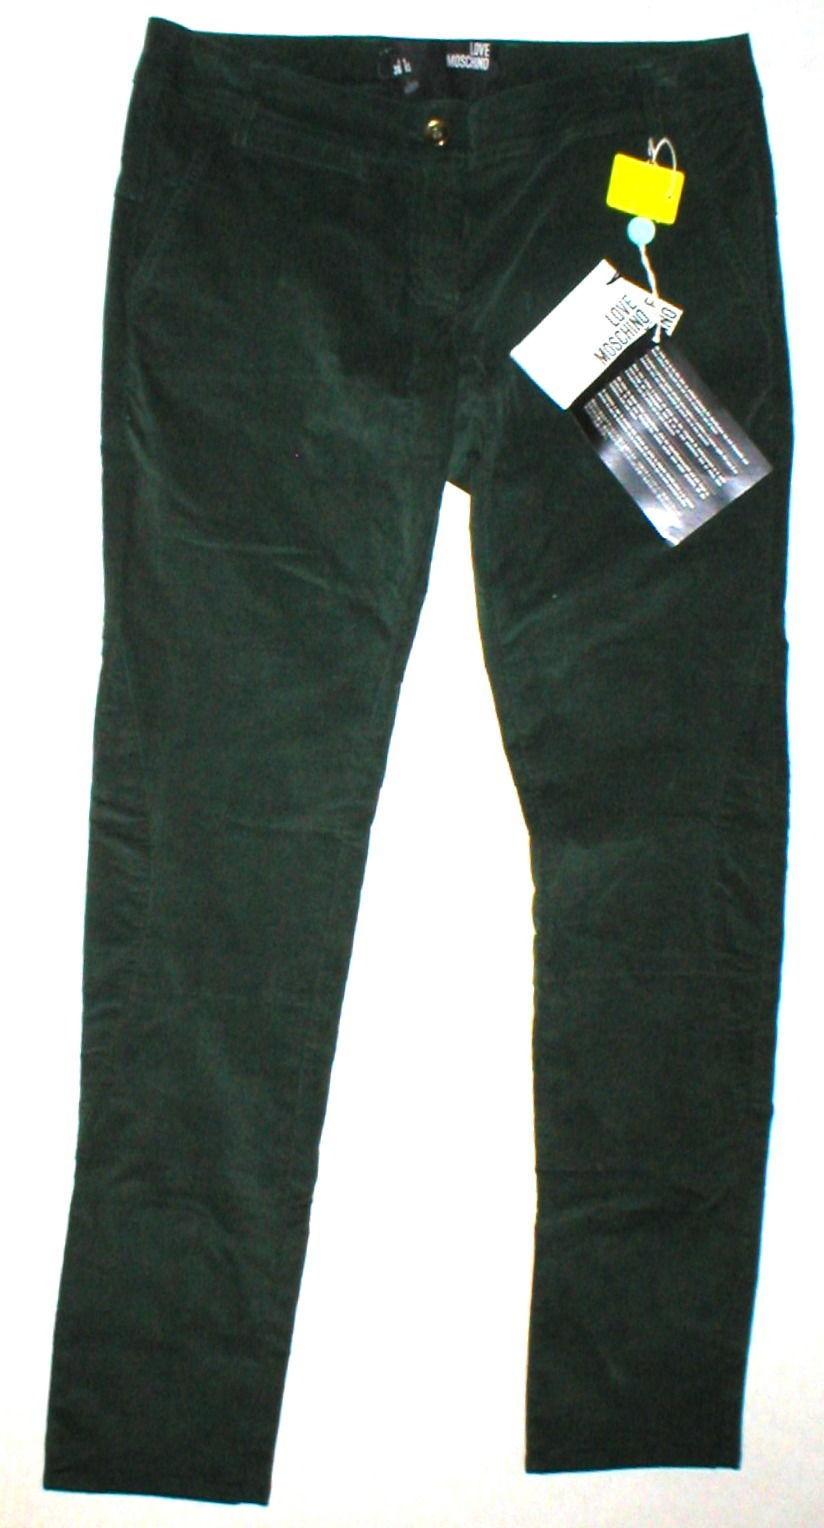 New NWT Womens 4 Dark Designer Love Moschino Green Velvet Pants Corduroy Skinny